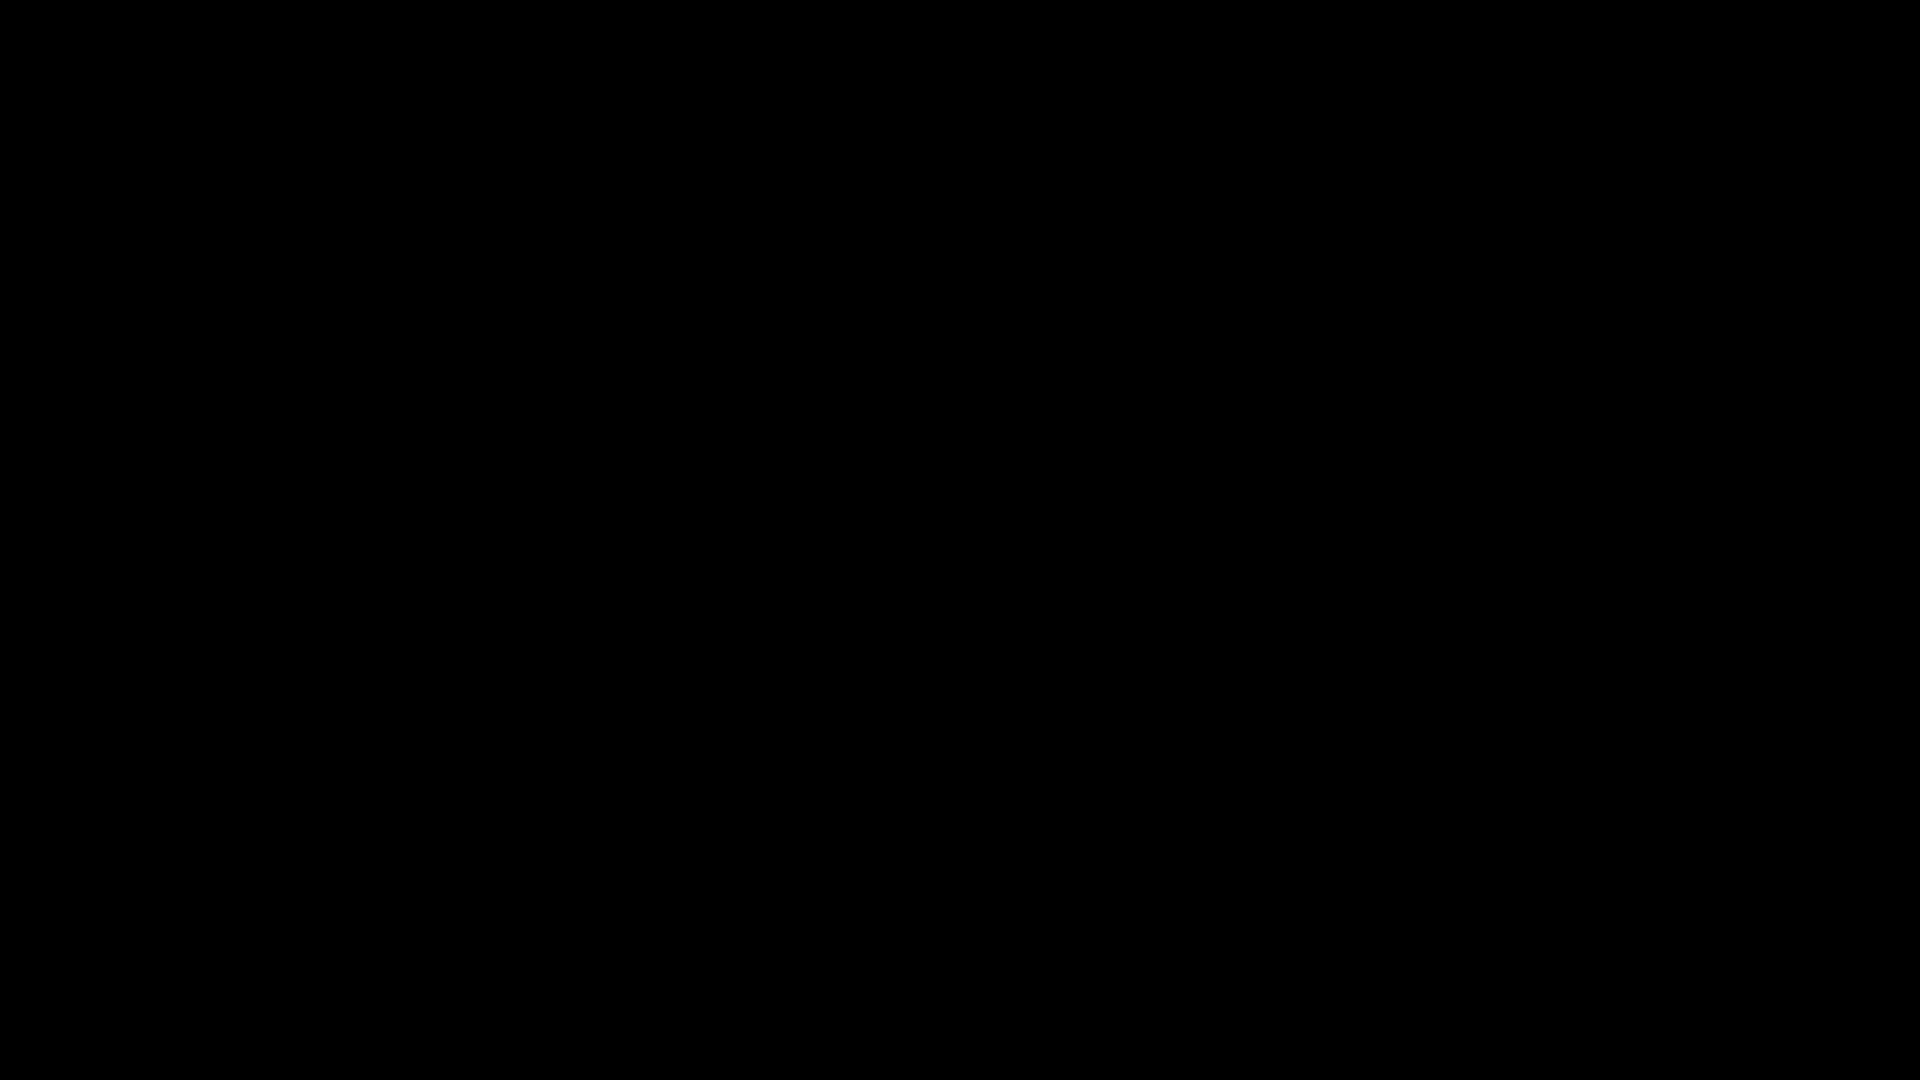 linuxmasterrace,  GIFs